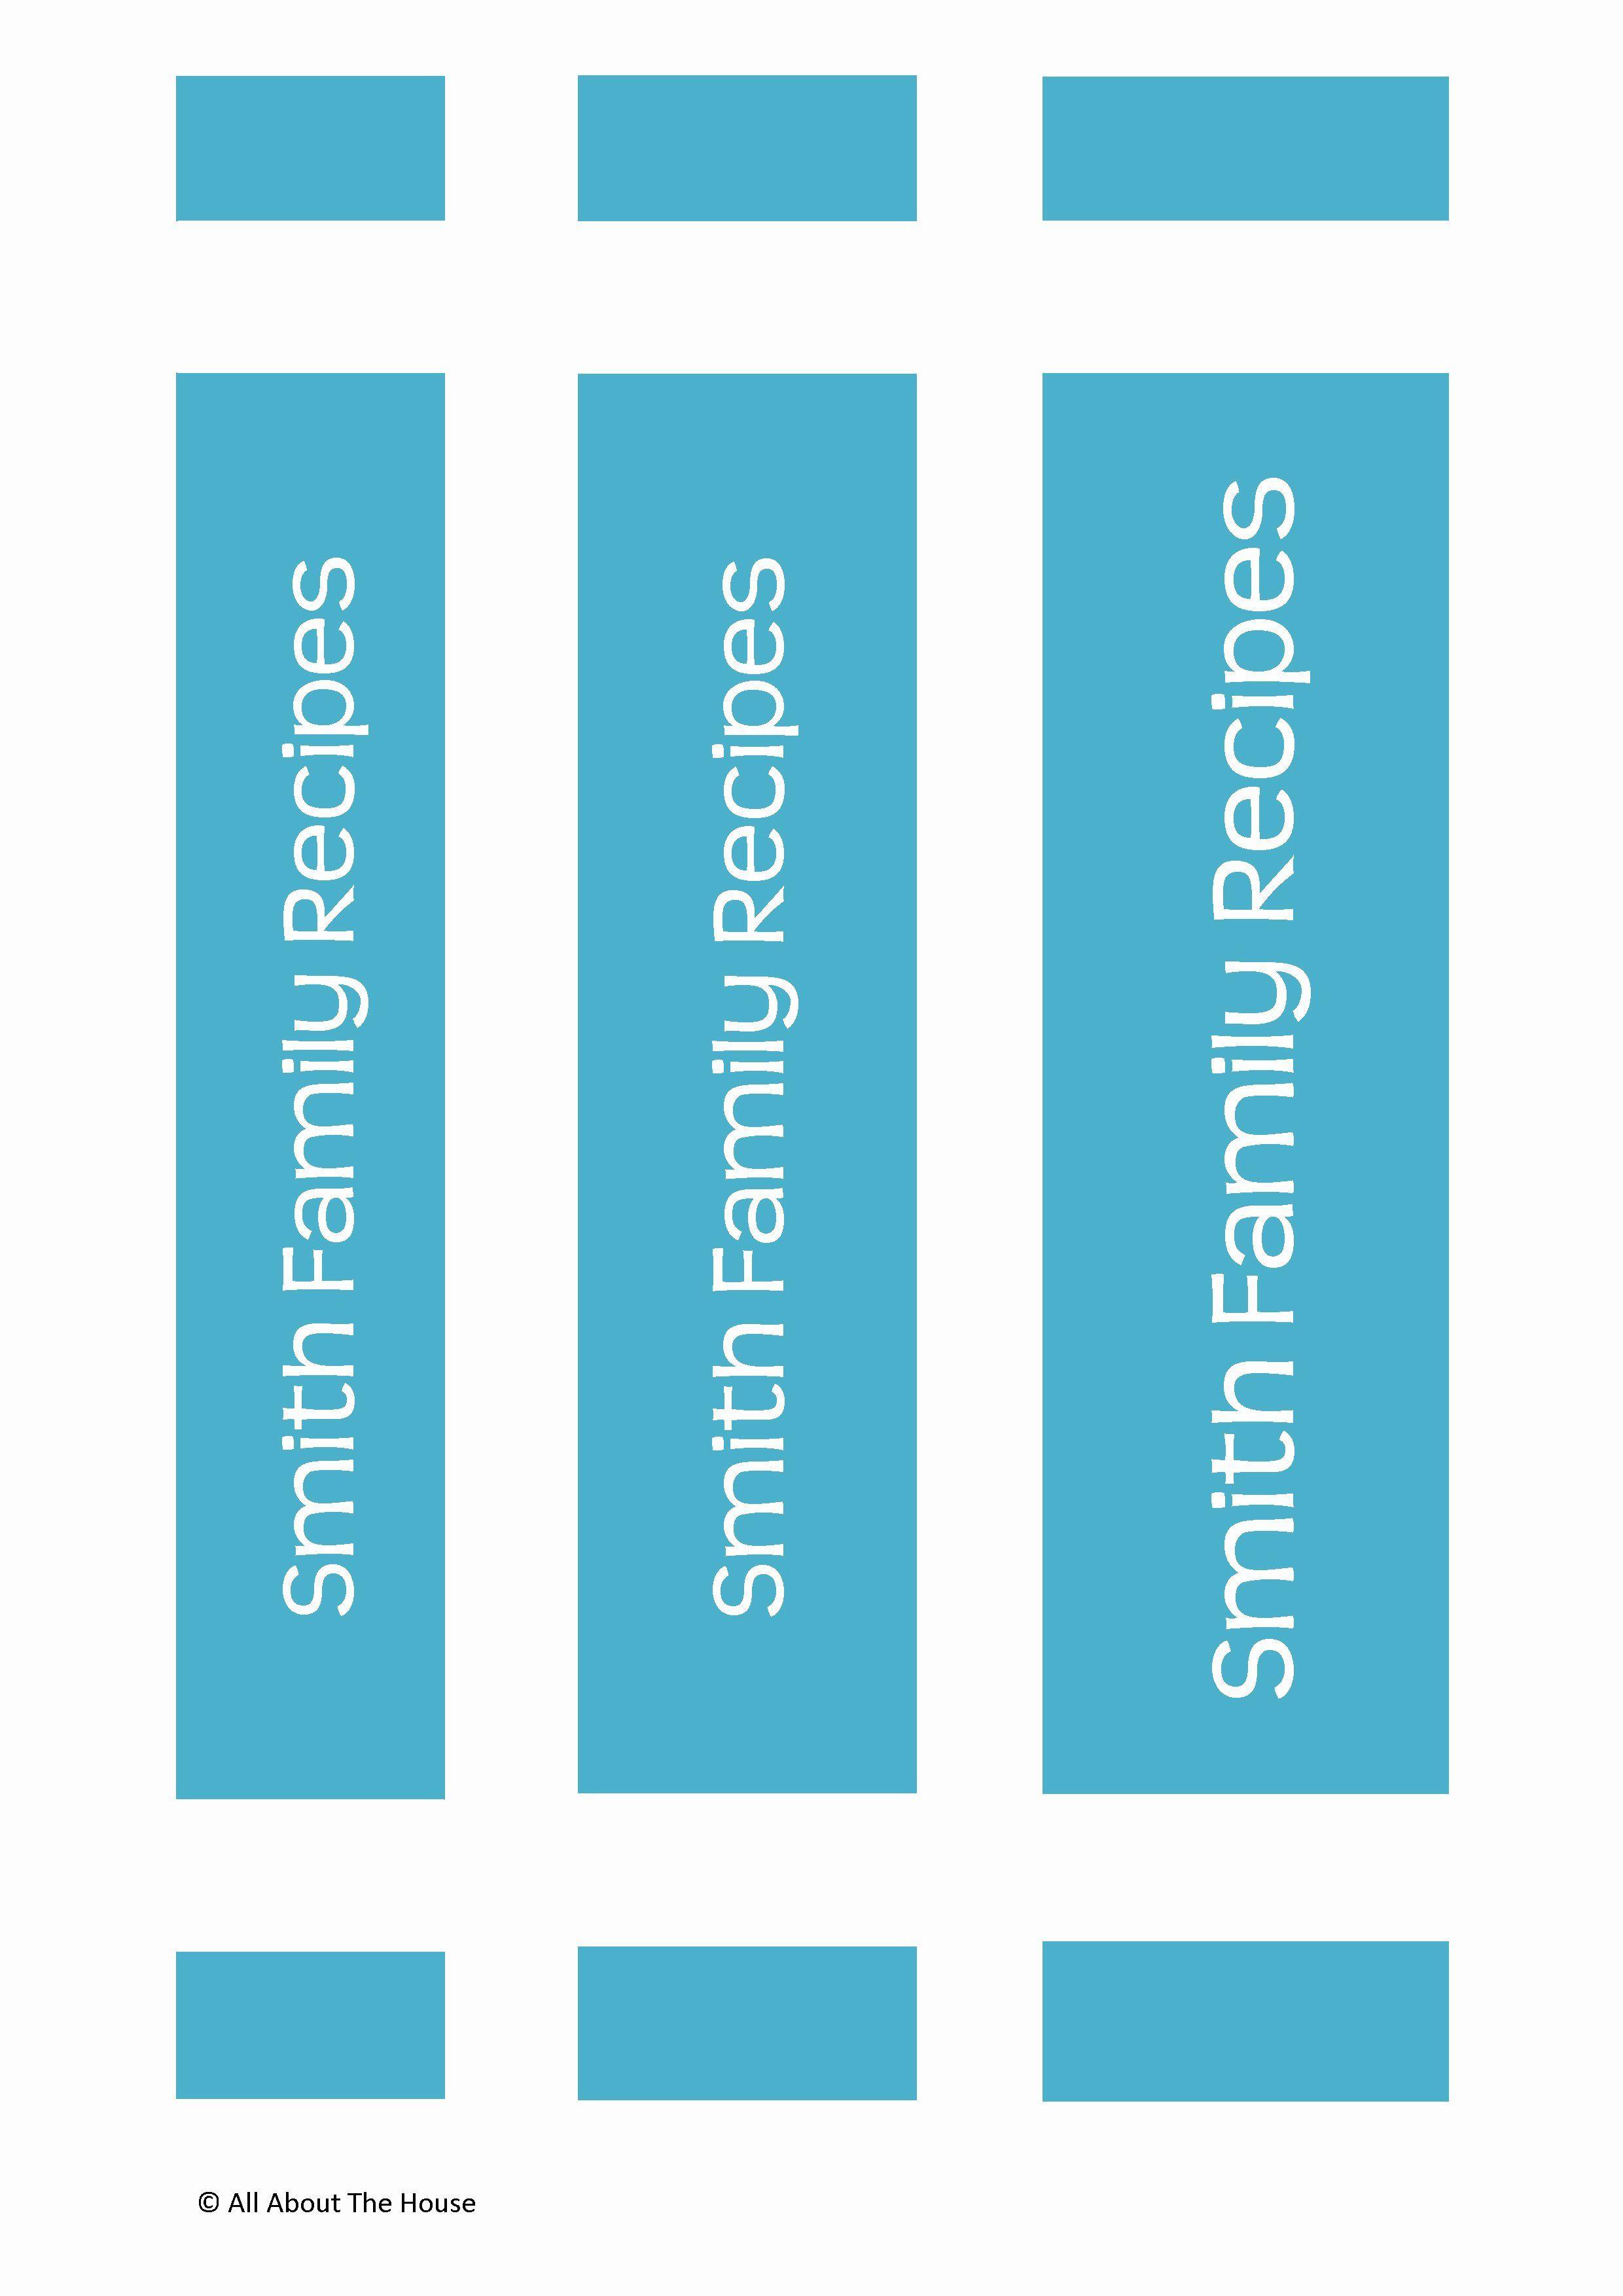 Binder Spine Label Template Fresh Make Your Own Personalised Printable Recipe Binder Binder Spine Labels Binder Labels Binder Cover Templates